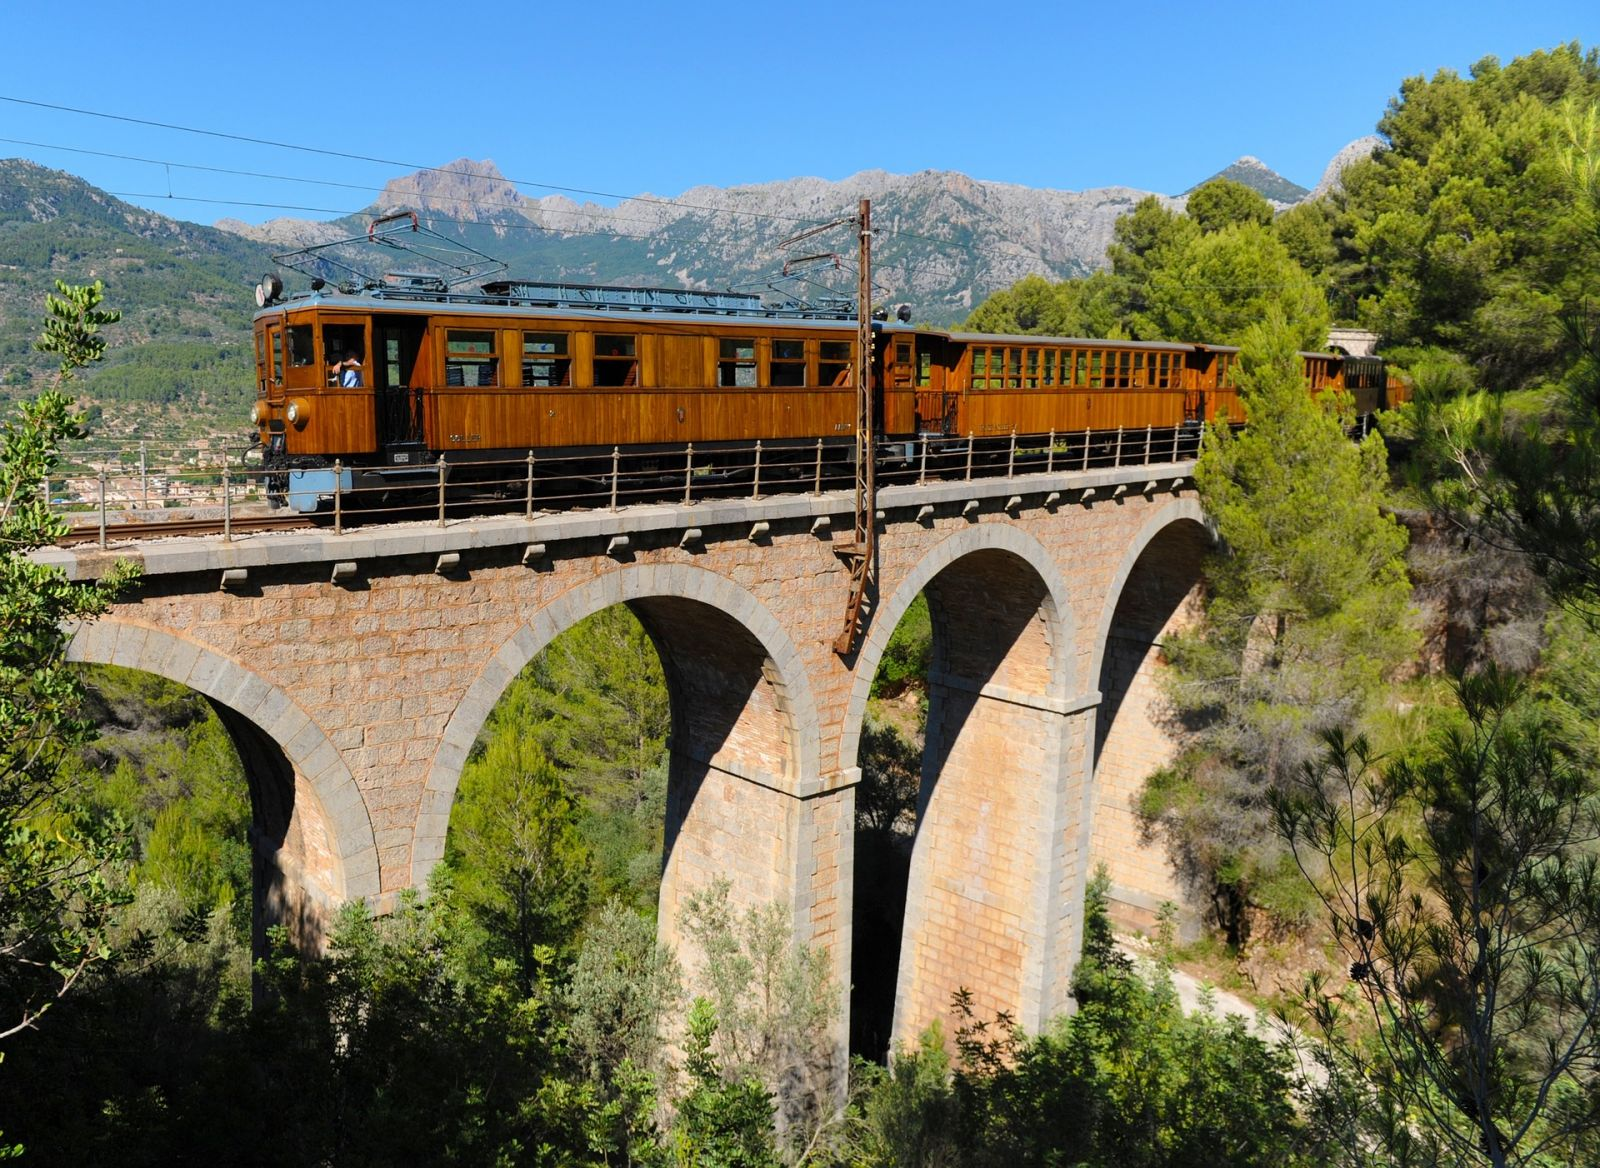 Places to visit in Palma de Mallorca